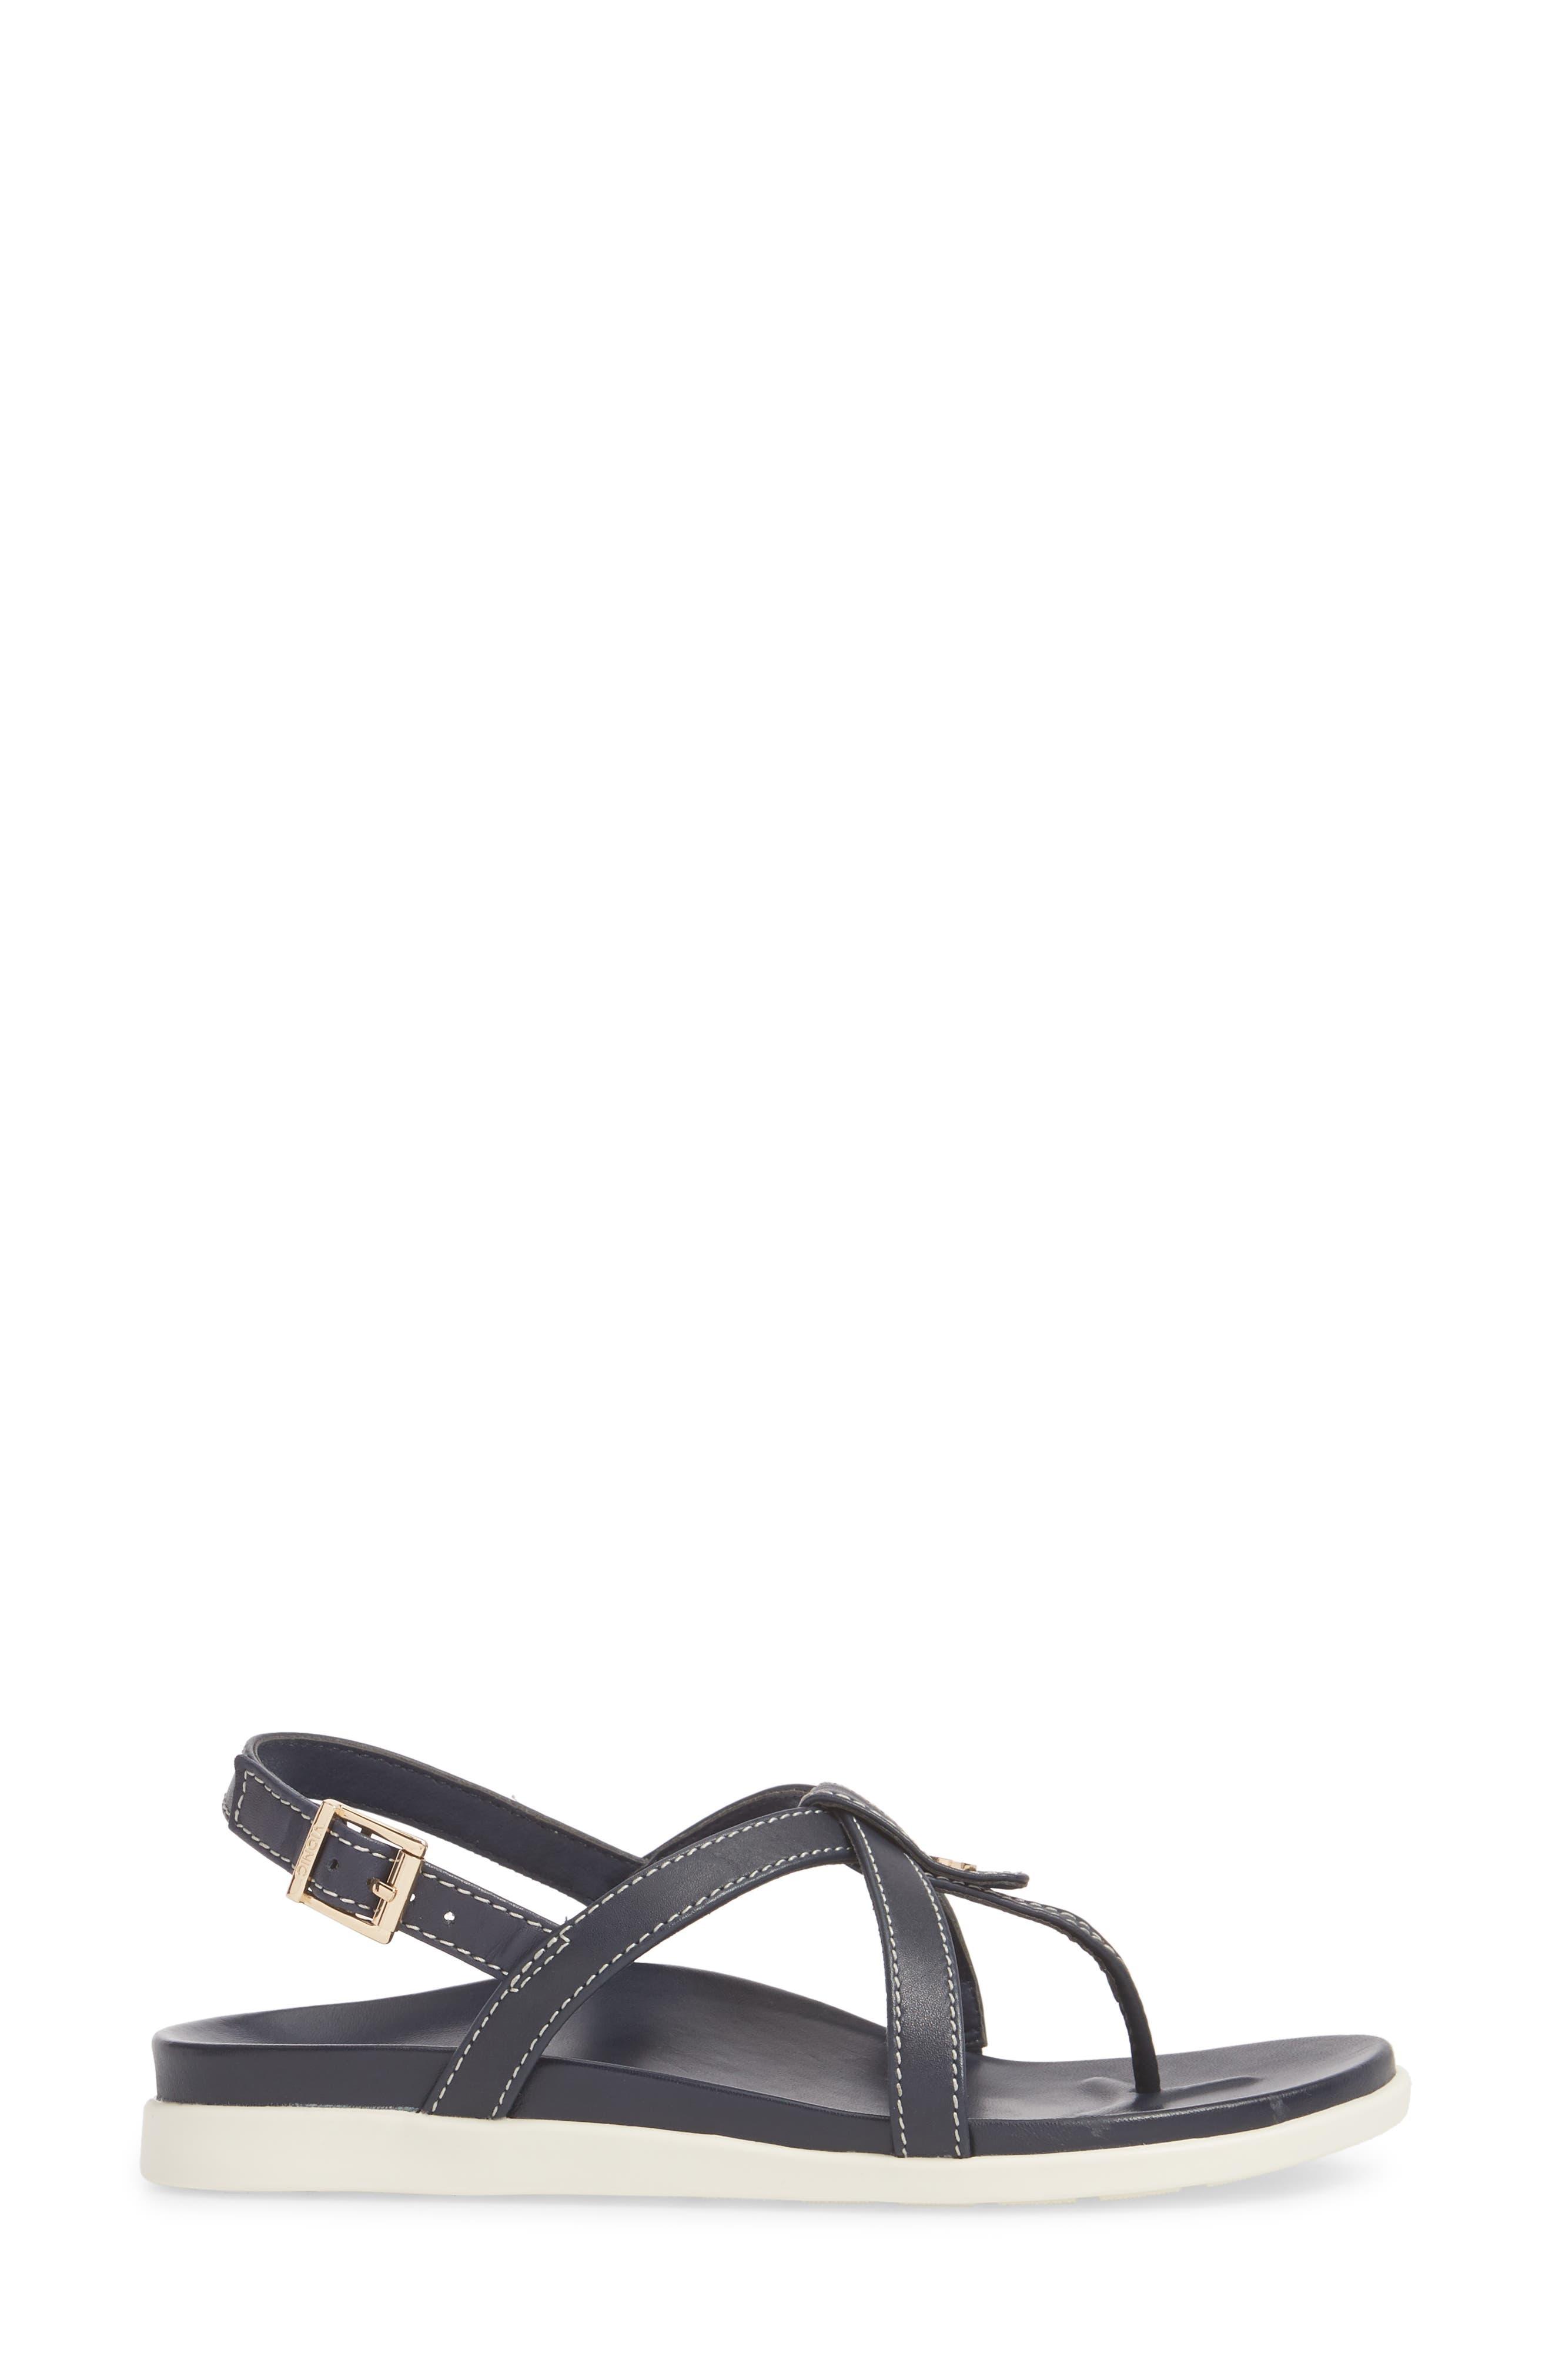 Veranda Orthaheel<sup>®</sup> Sandal,                             Alternate thumbnail 6, color,                             Navy Leather